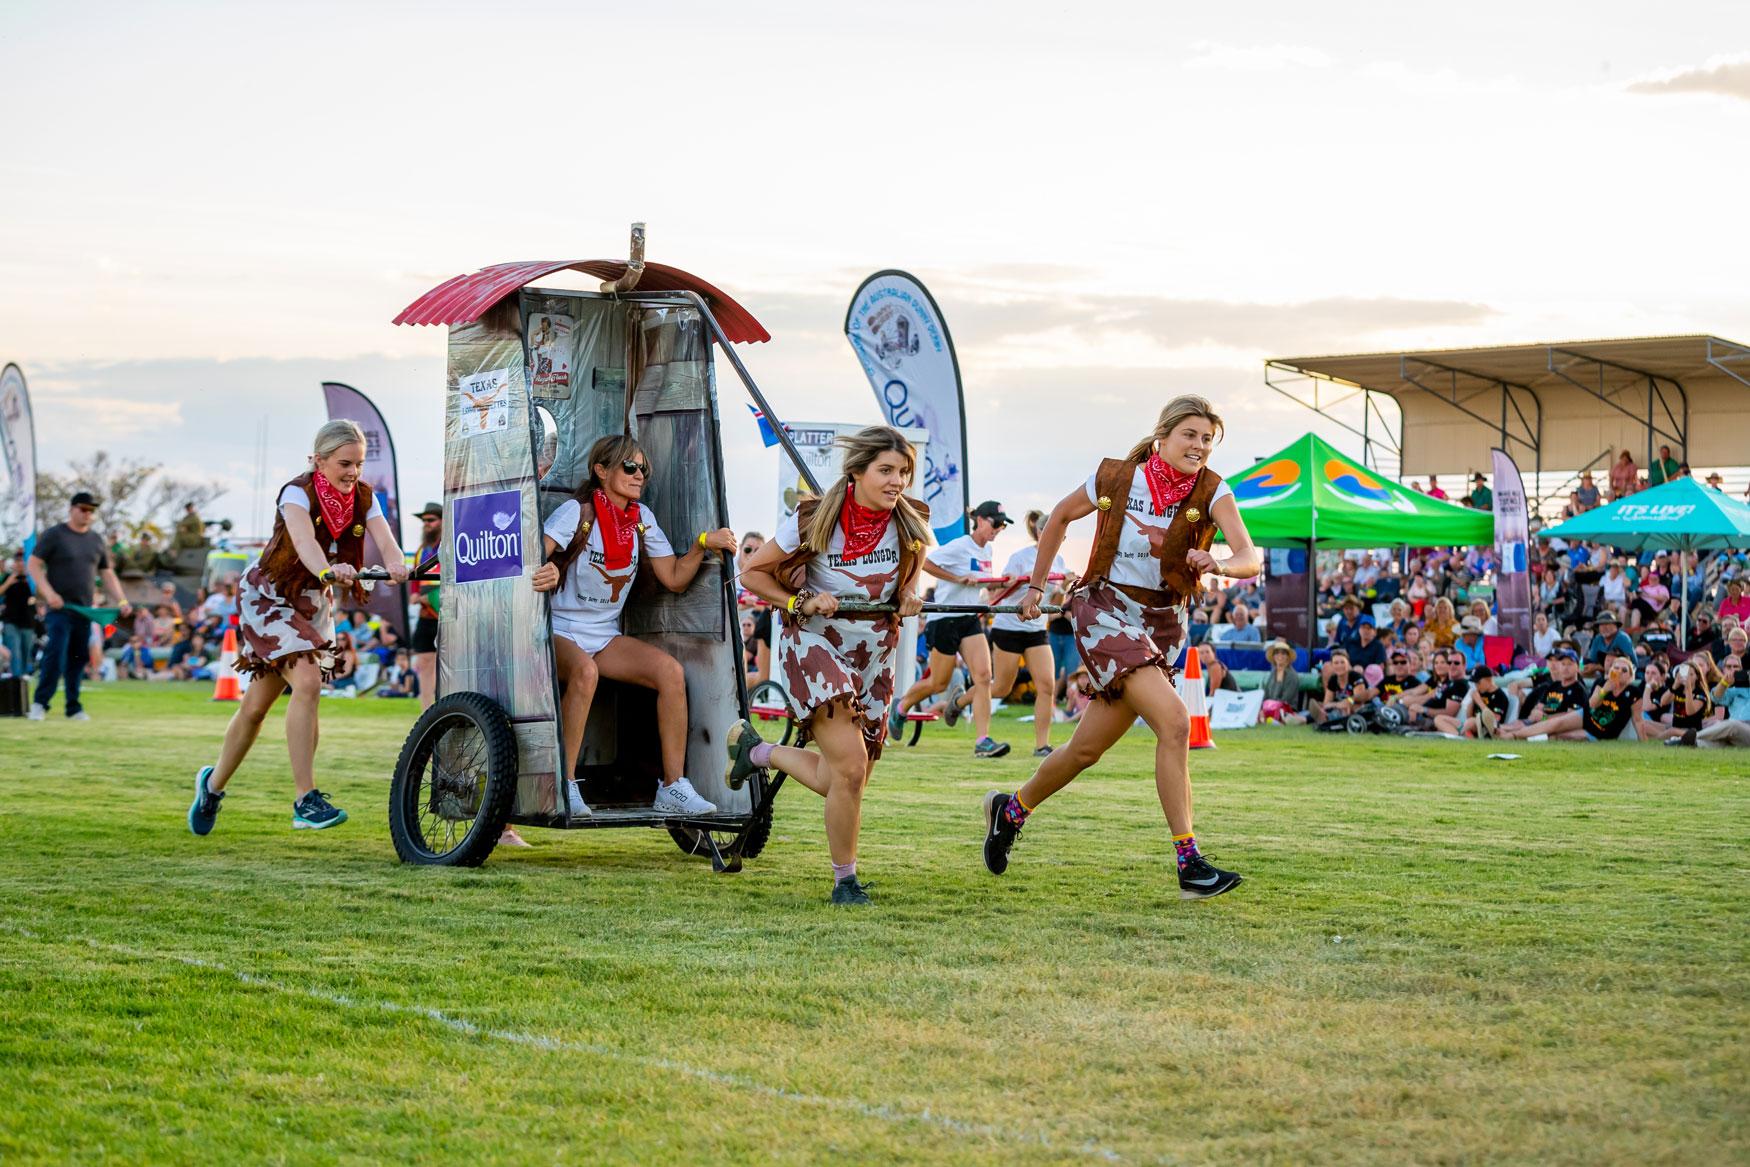 Dunny Derby cowgirls running